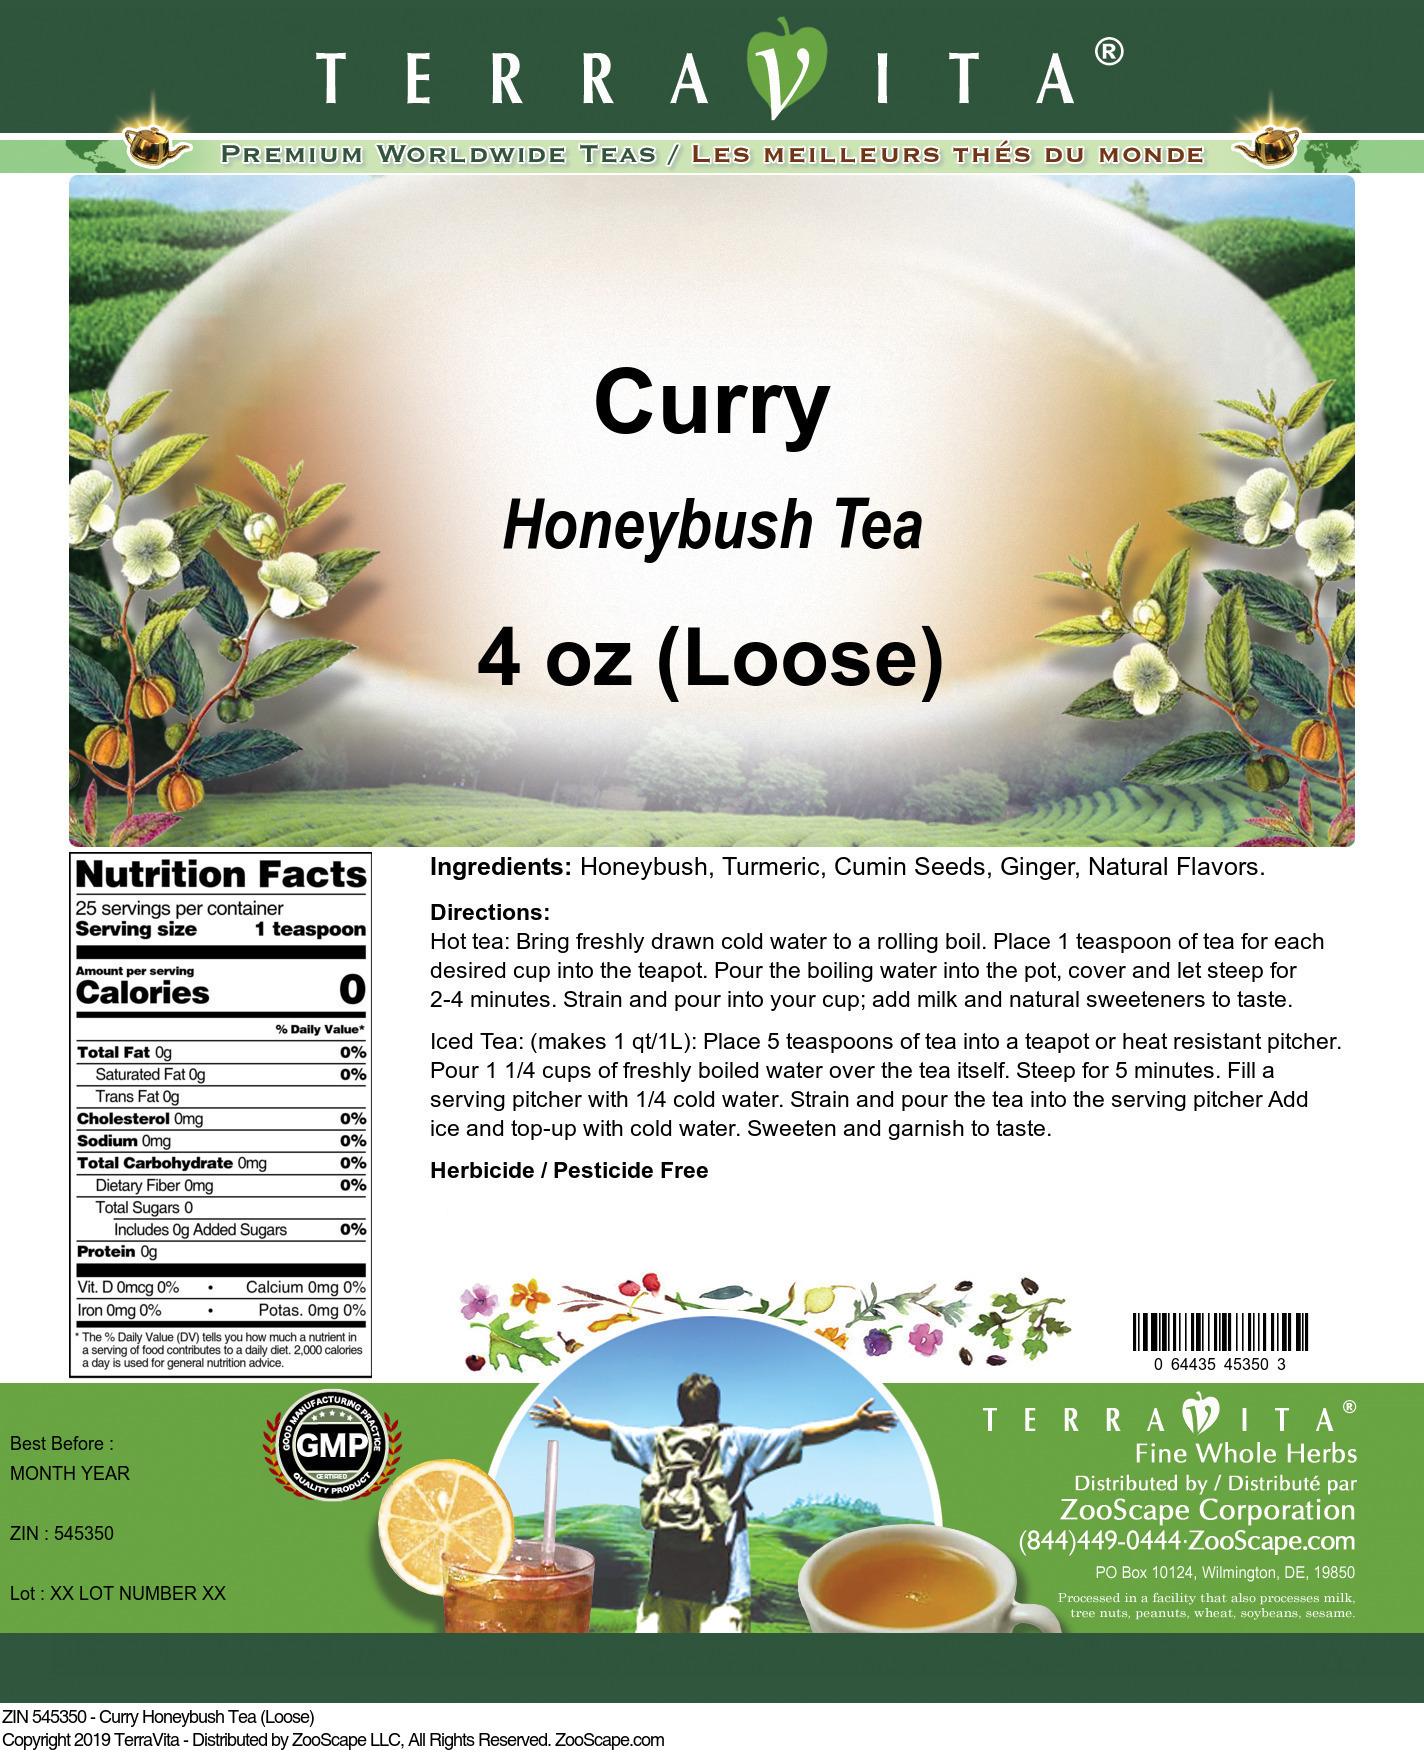 Curry Honeybush Tea (Loose)